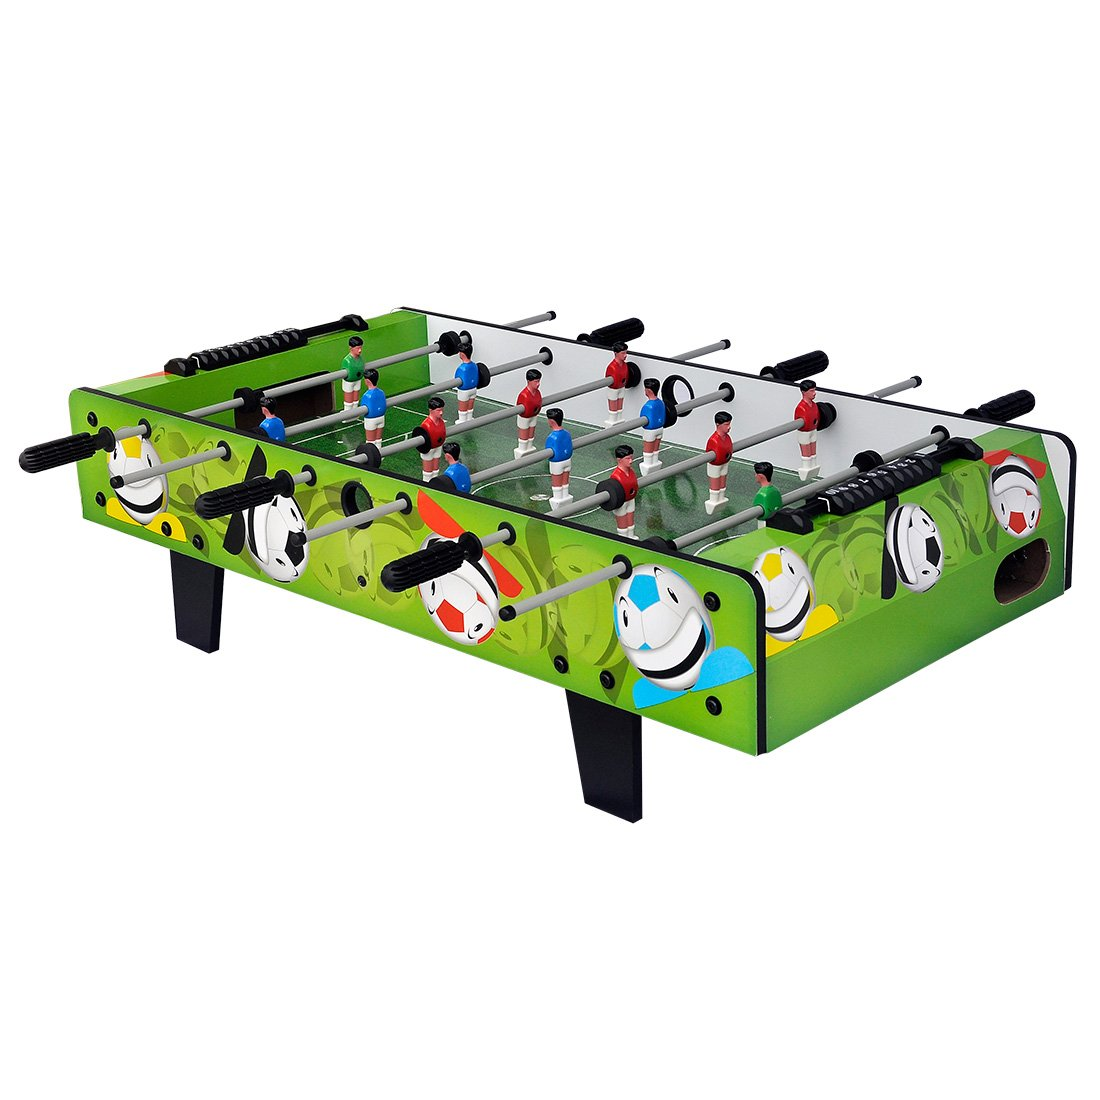 HLC Mesa de toys-3 pies fútbol futbolín kick-off-grass niños verde ...